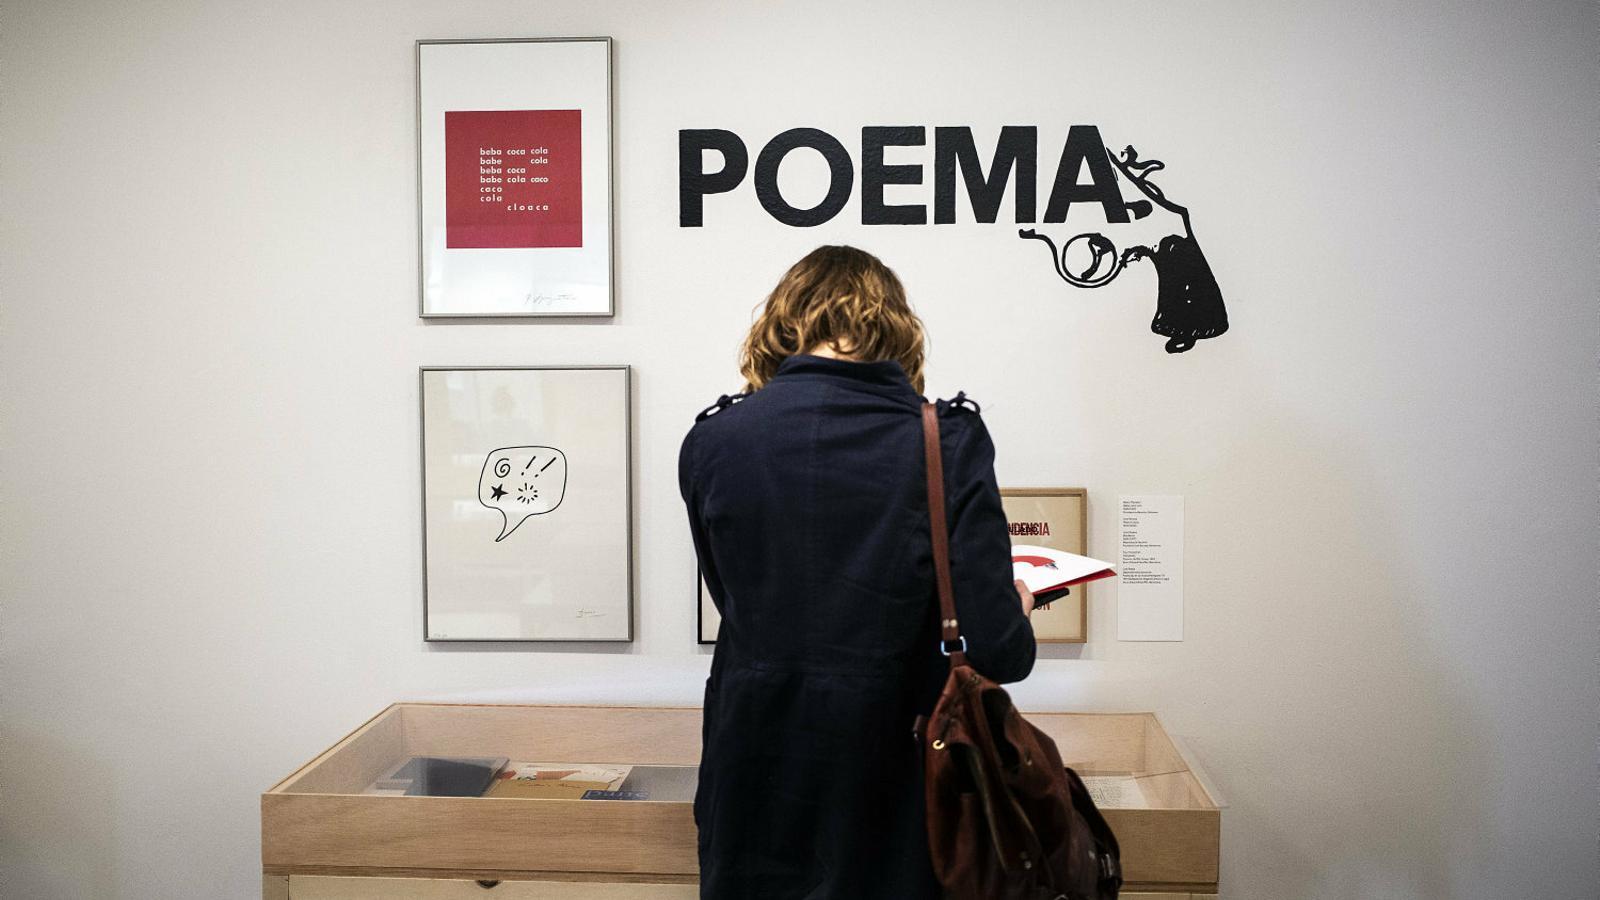 Poesia experimental apta per a mil·lennials